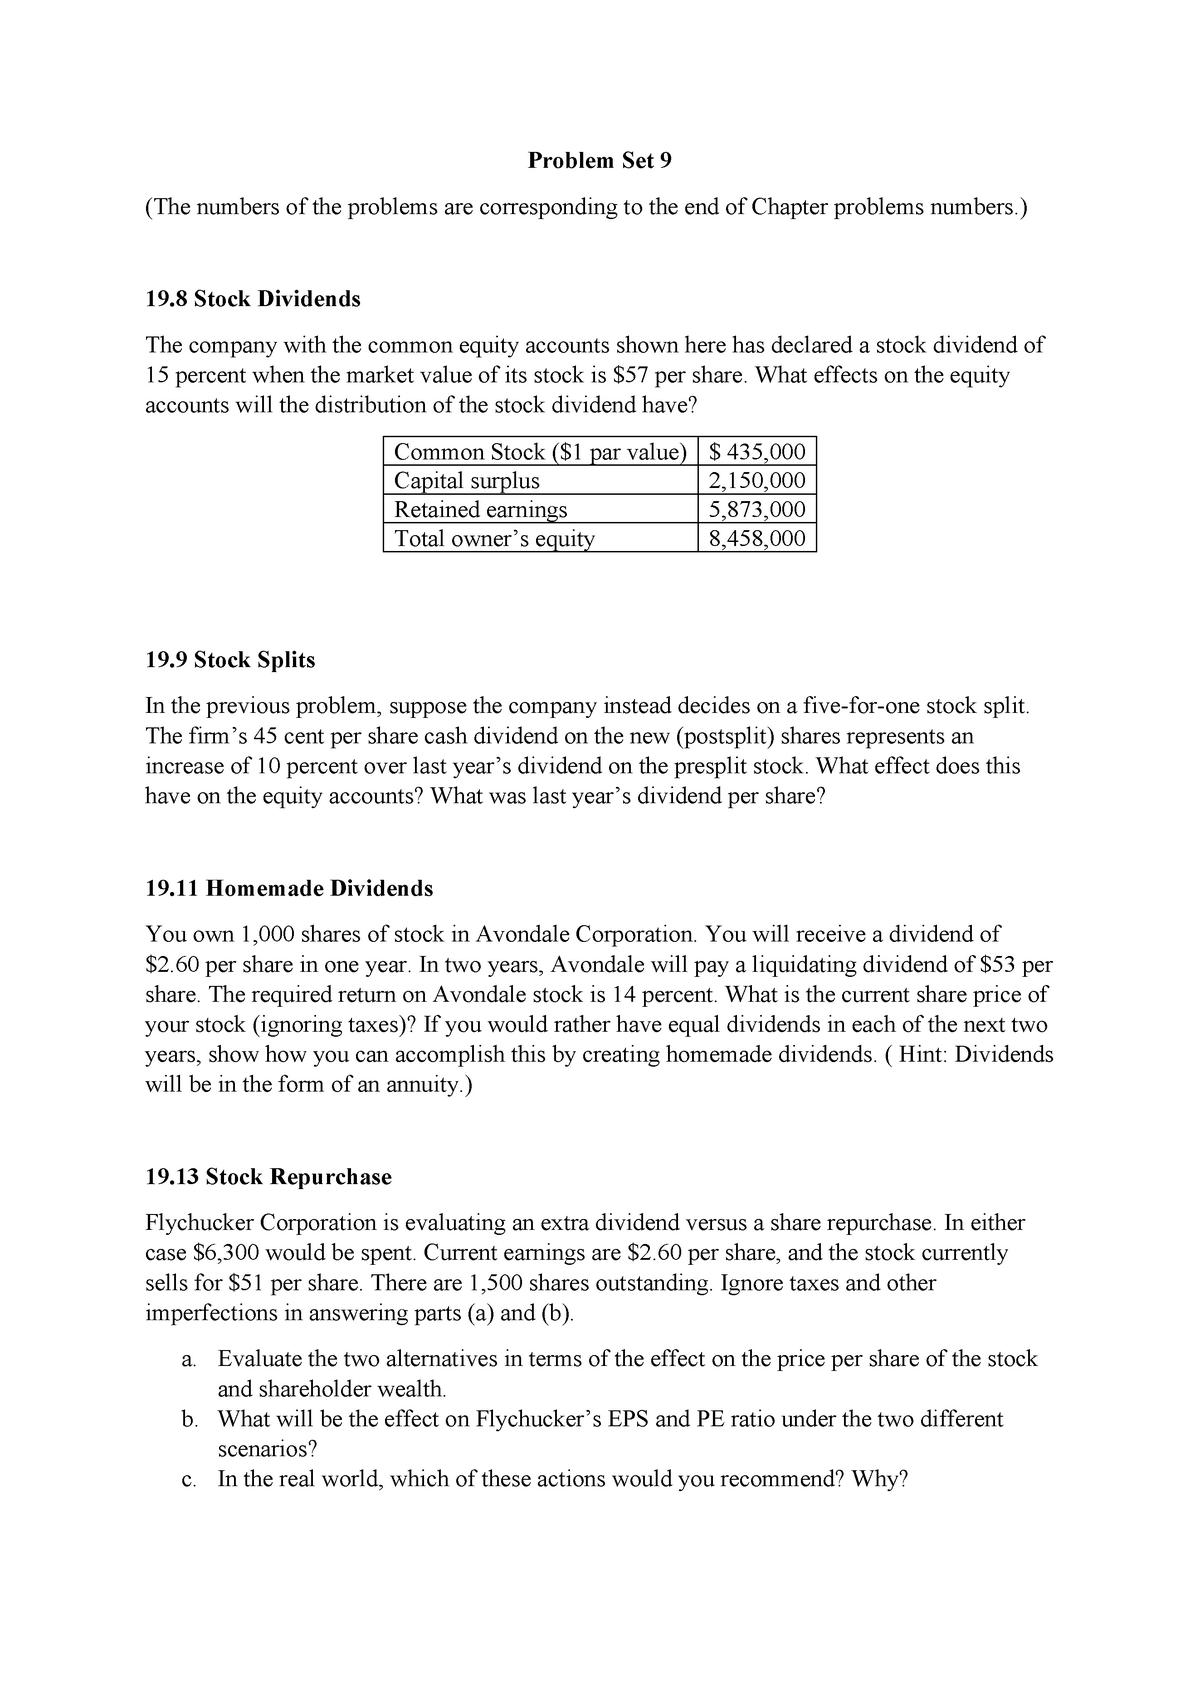 Problem Set 9 - AFIN250 Investments - MQ - StuDocu